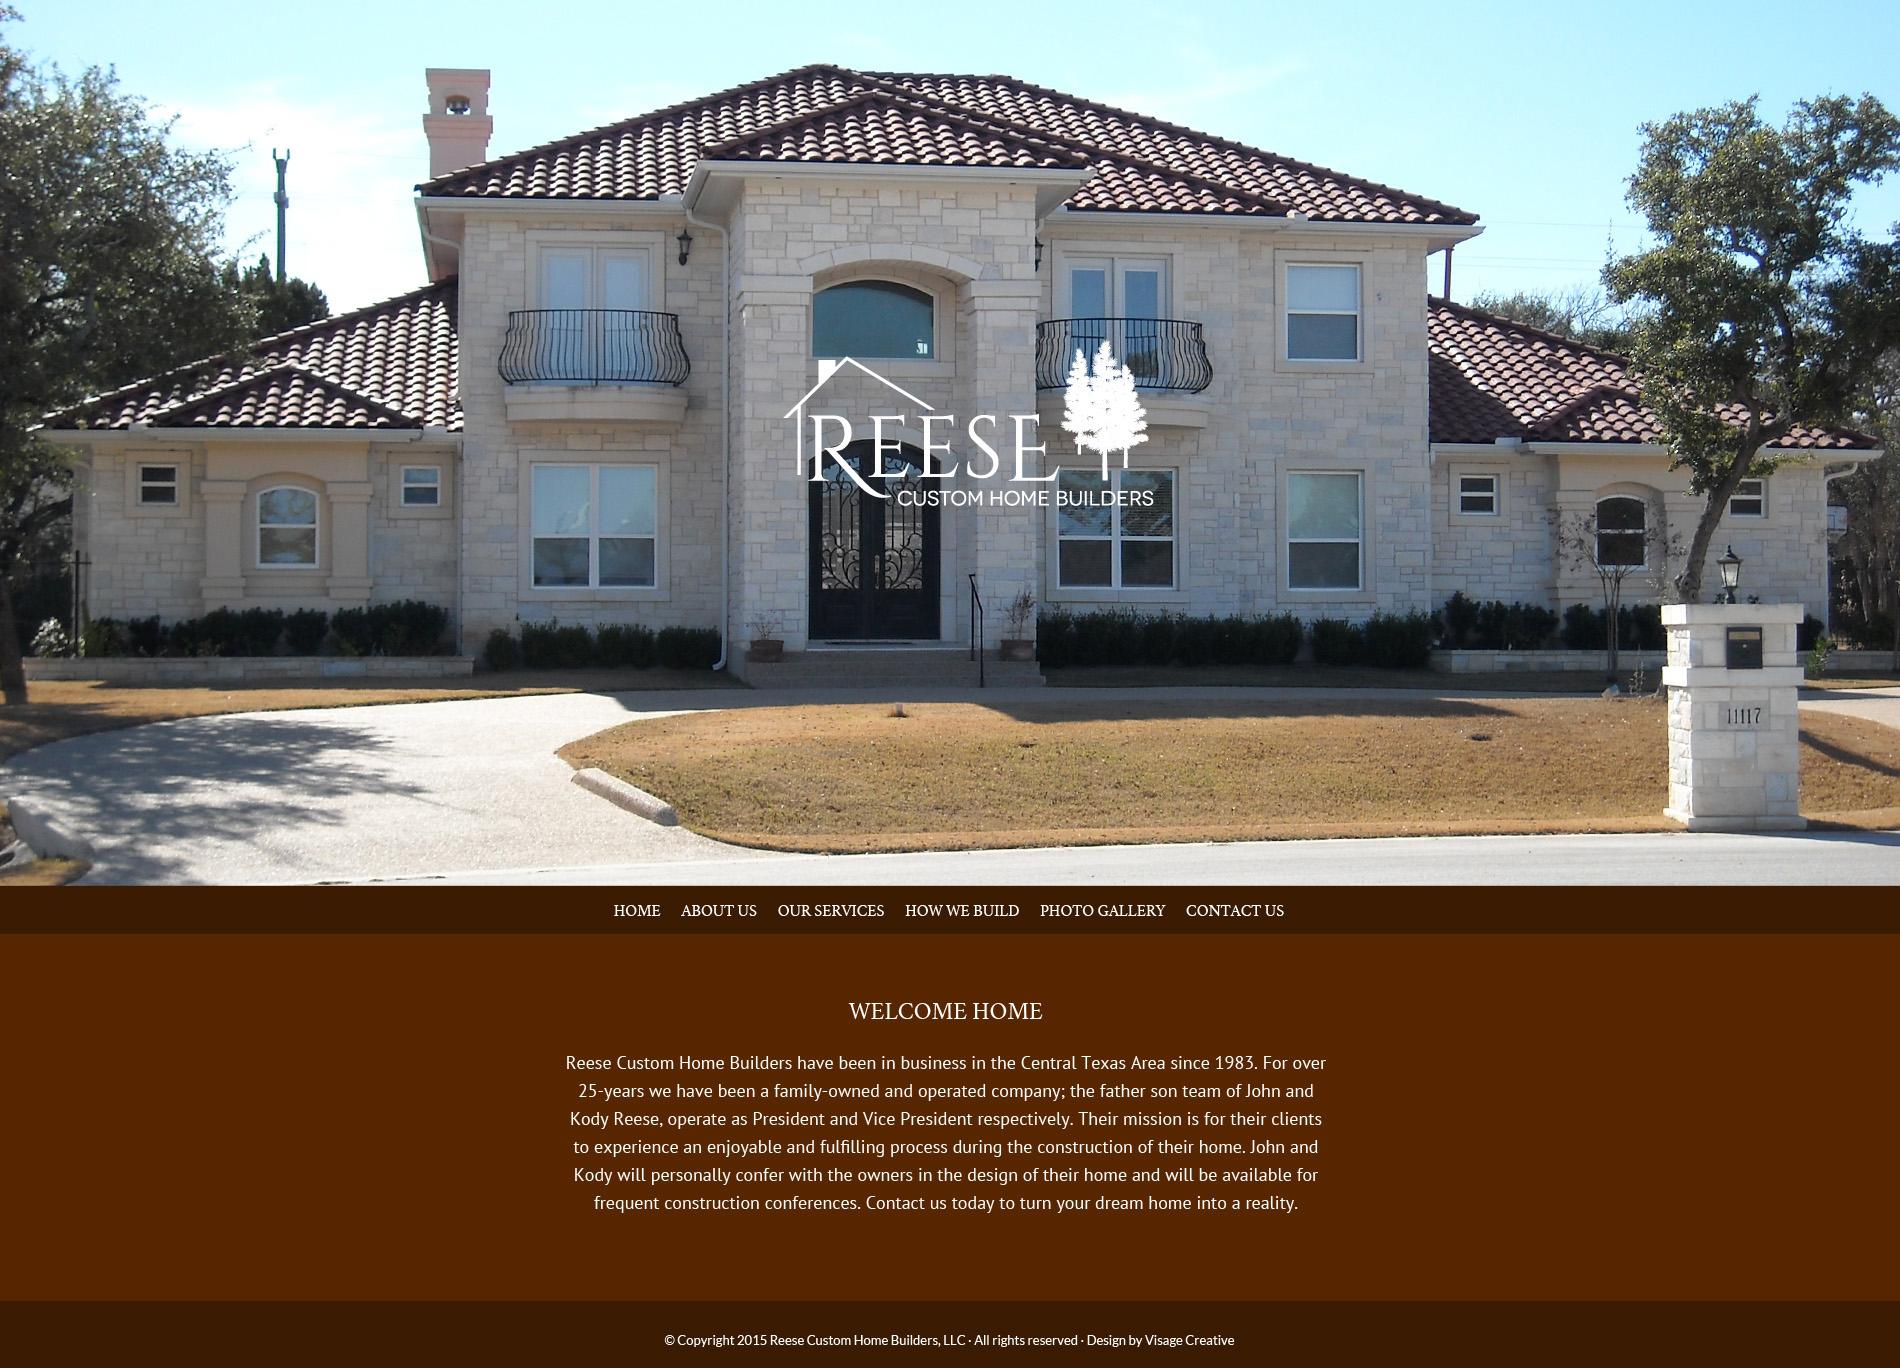 reese-web-mockup3